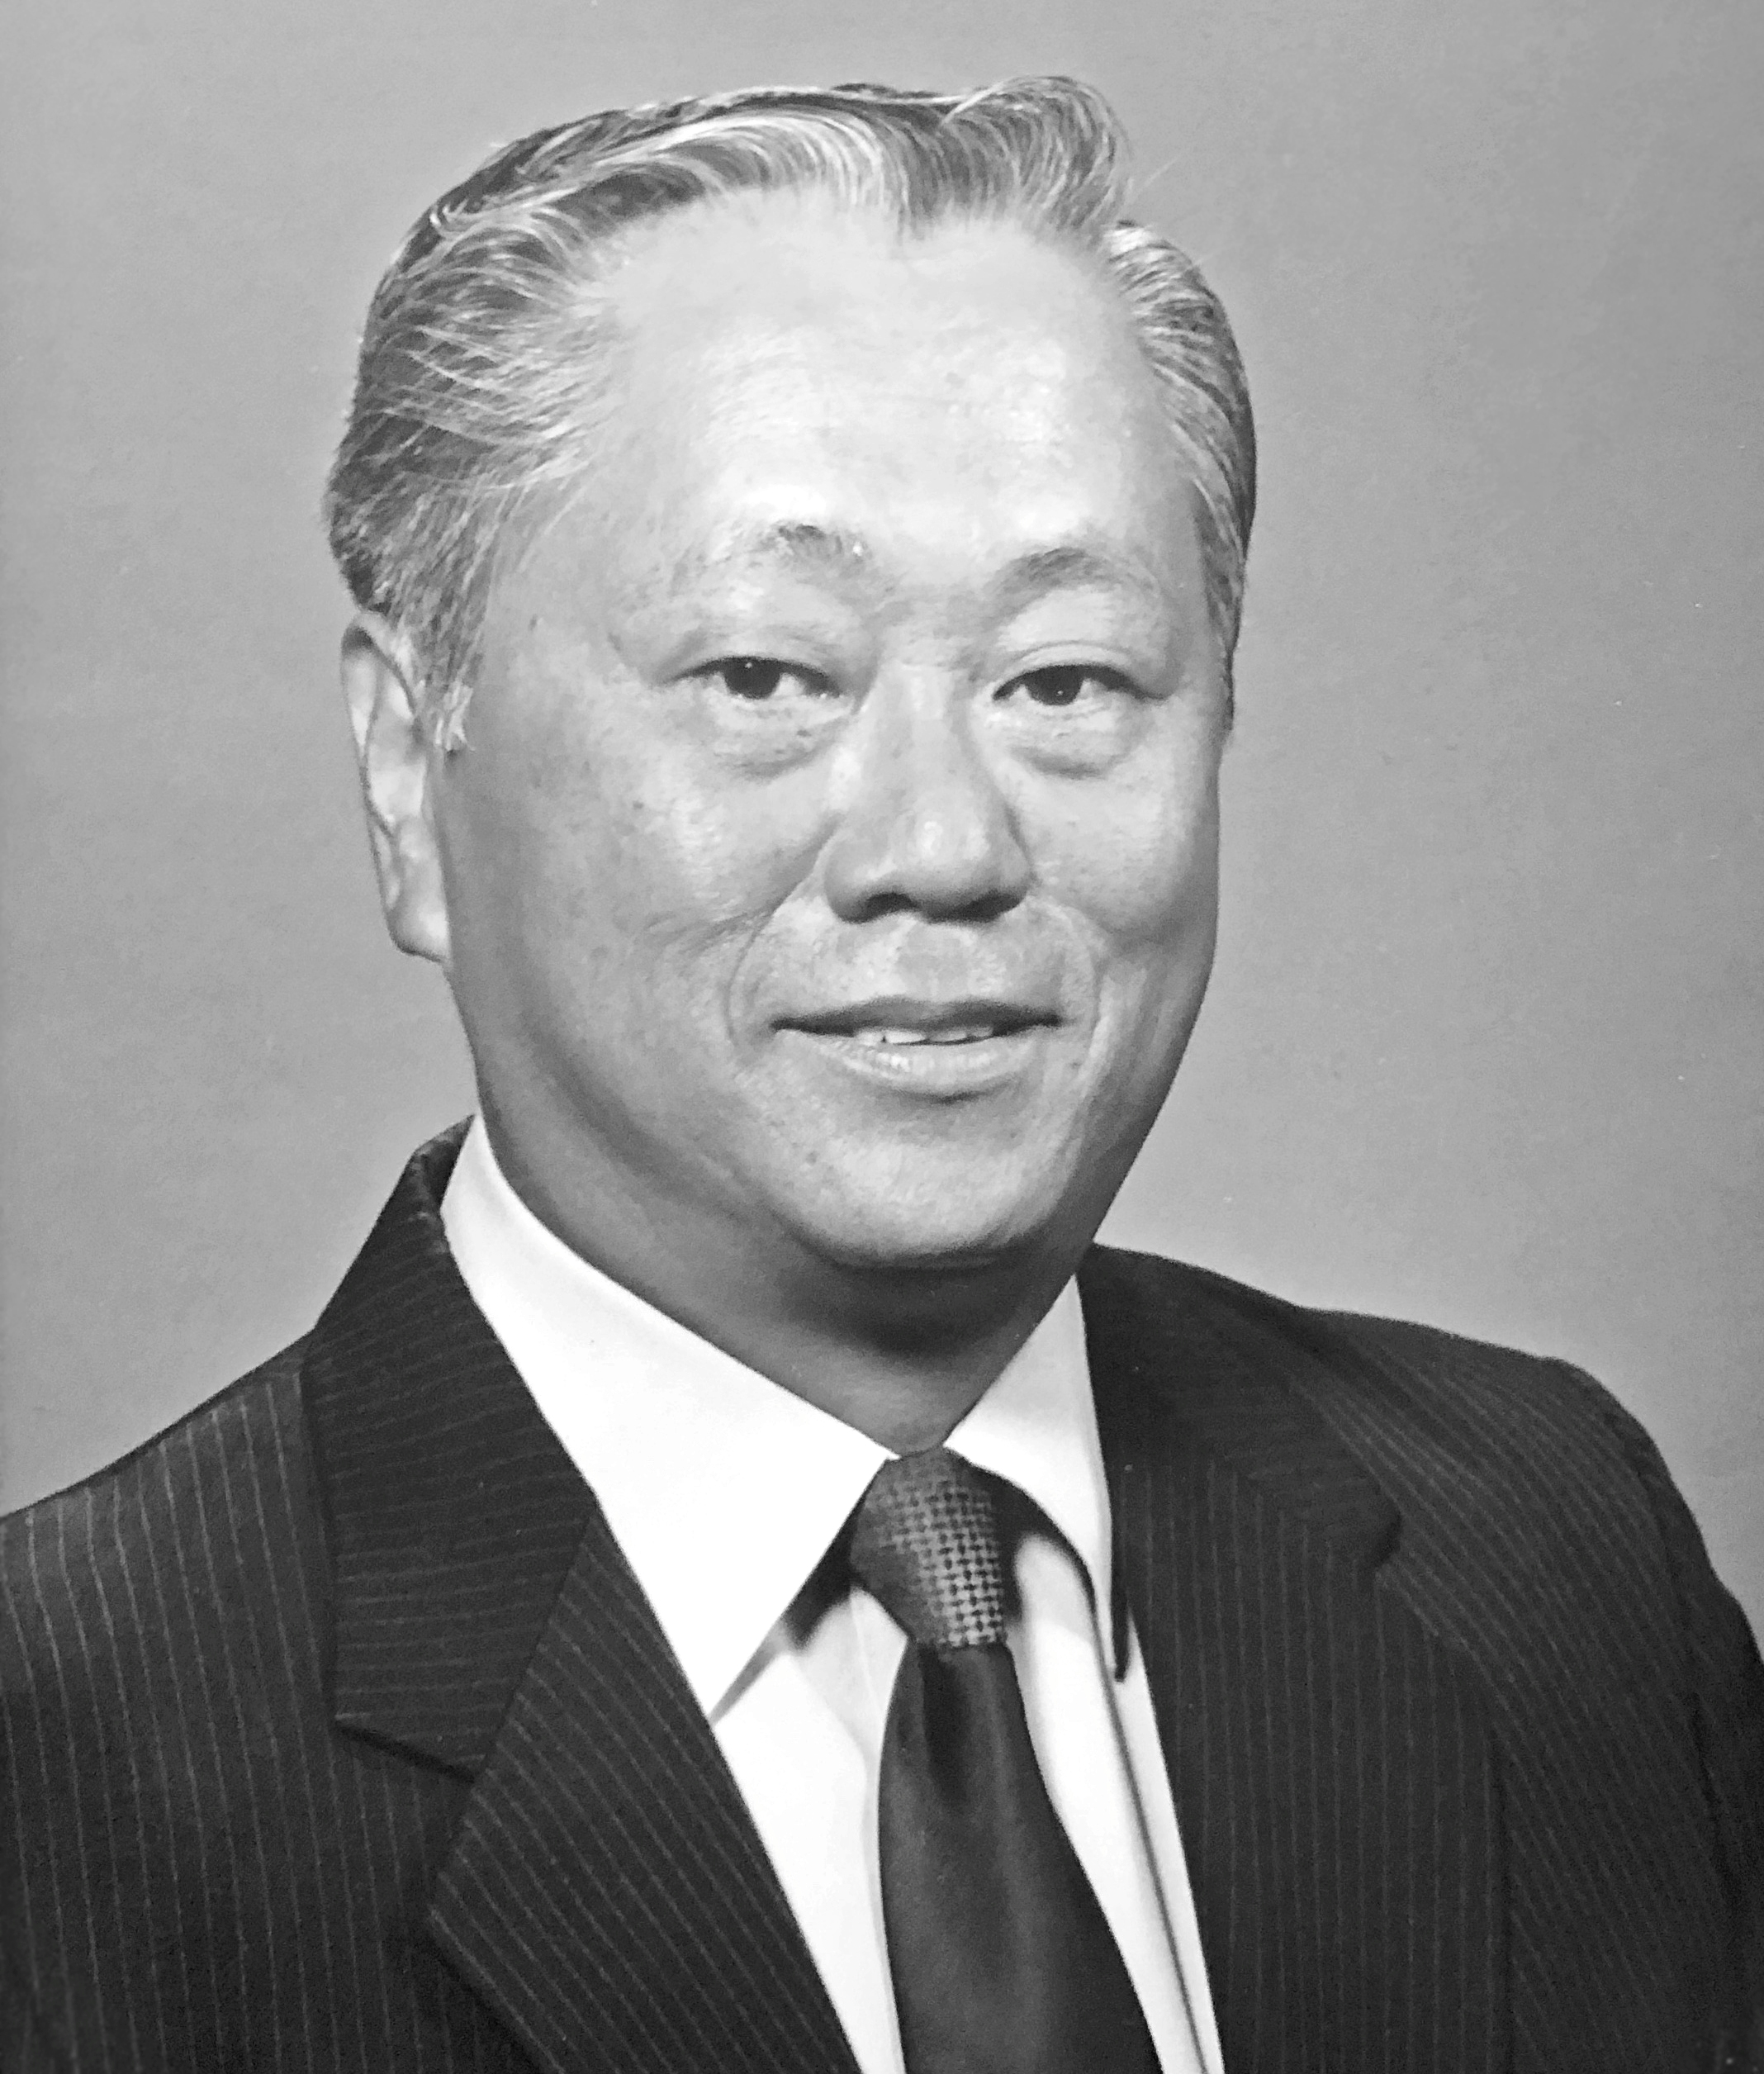 WALTER JUNICHI MINAMI